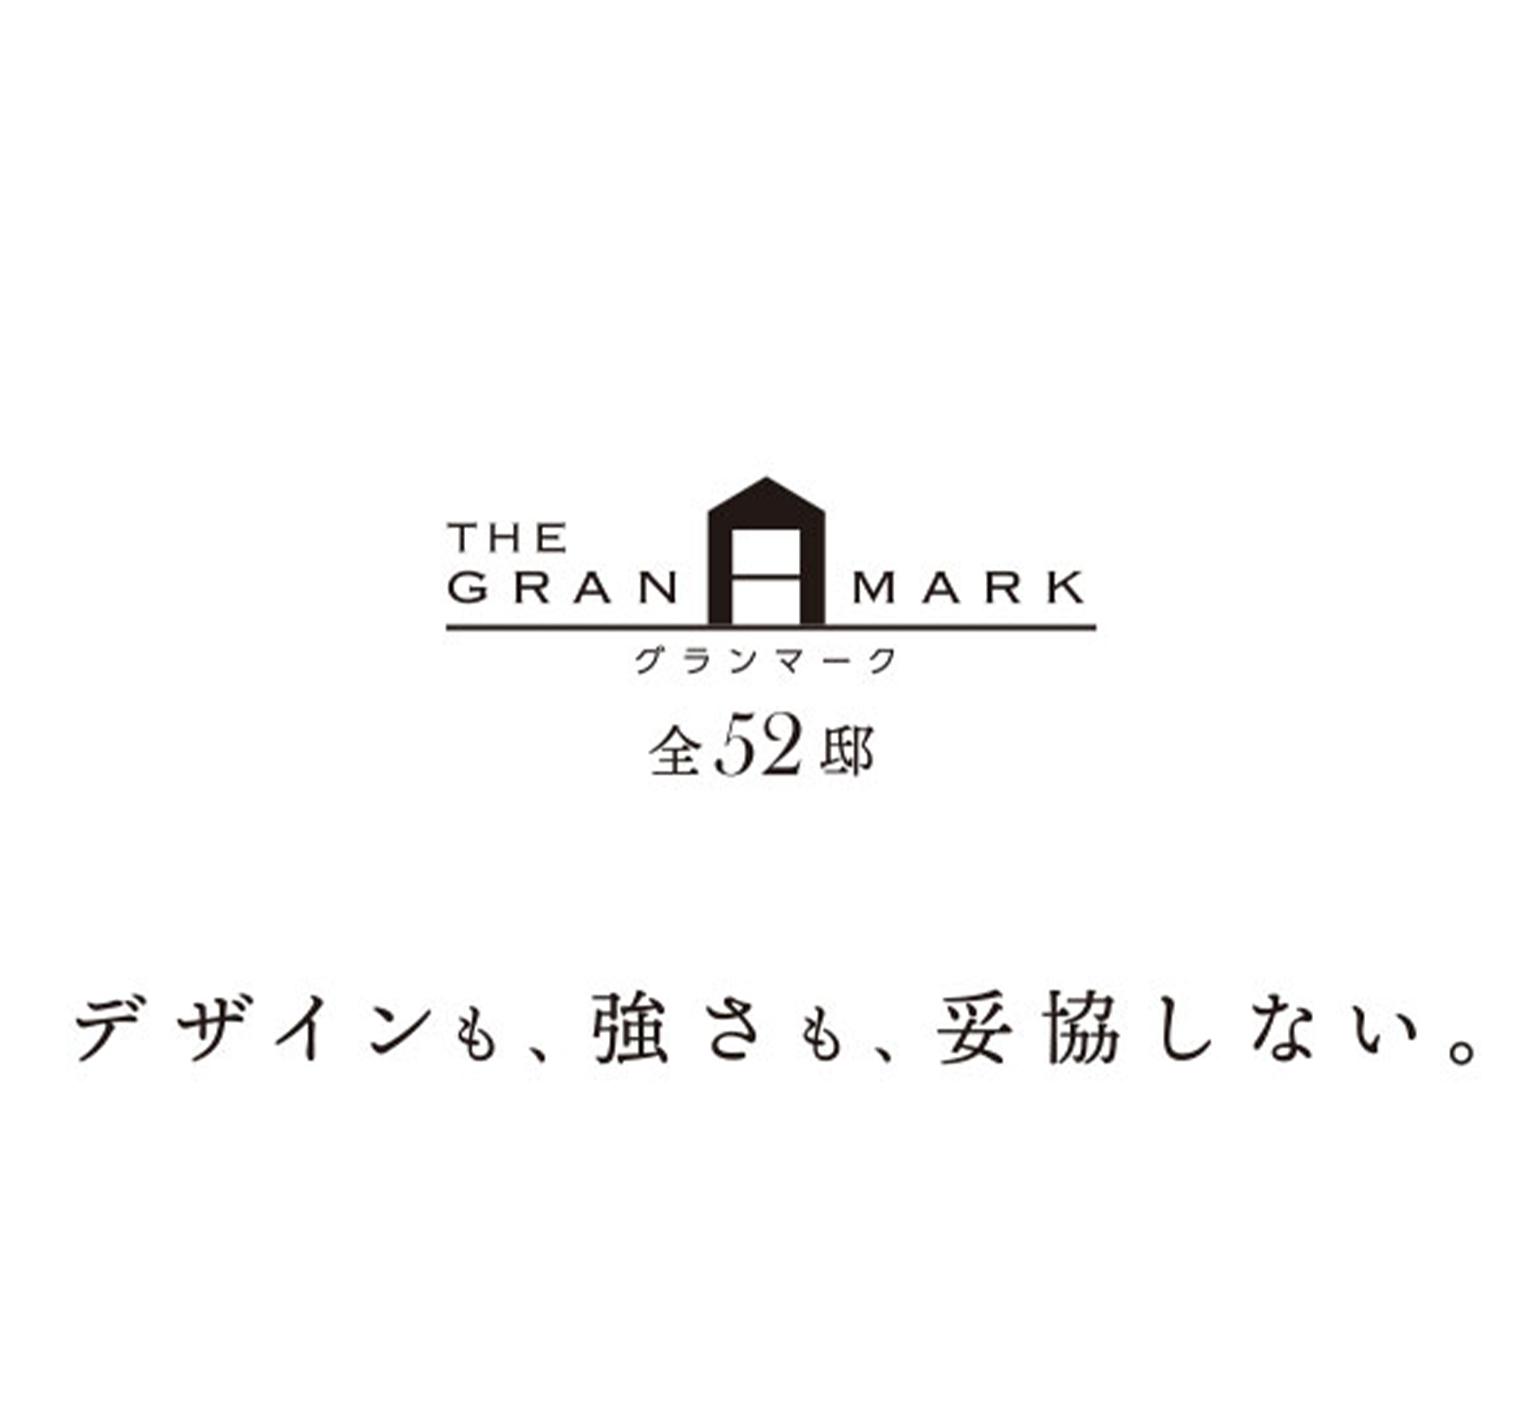 file_name_sp-file_name_sp-SP.jpg